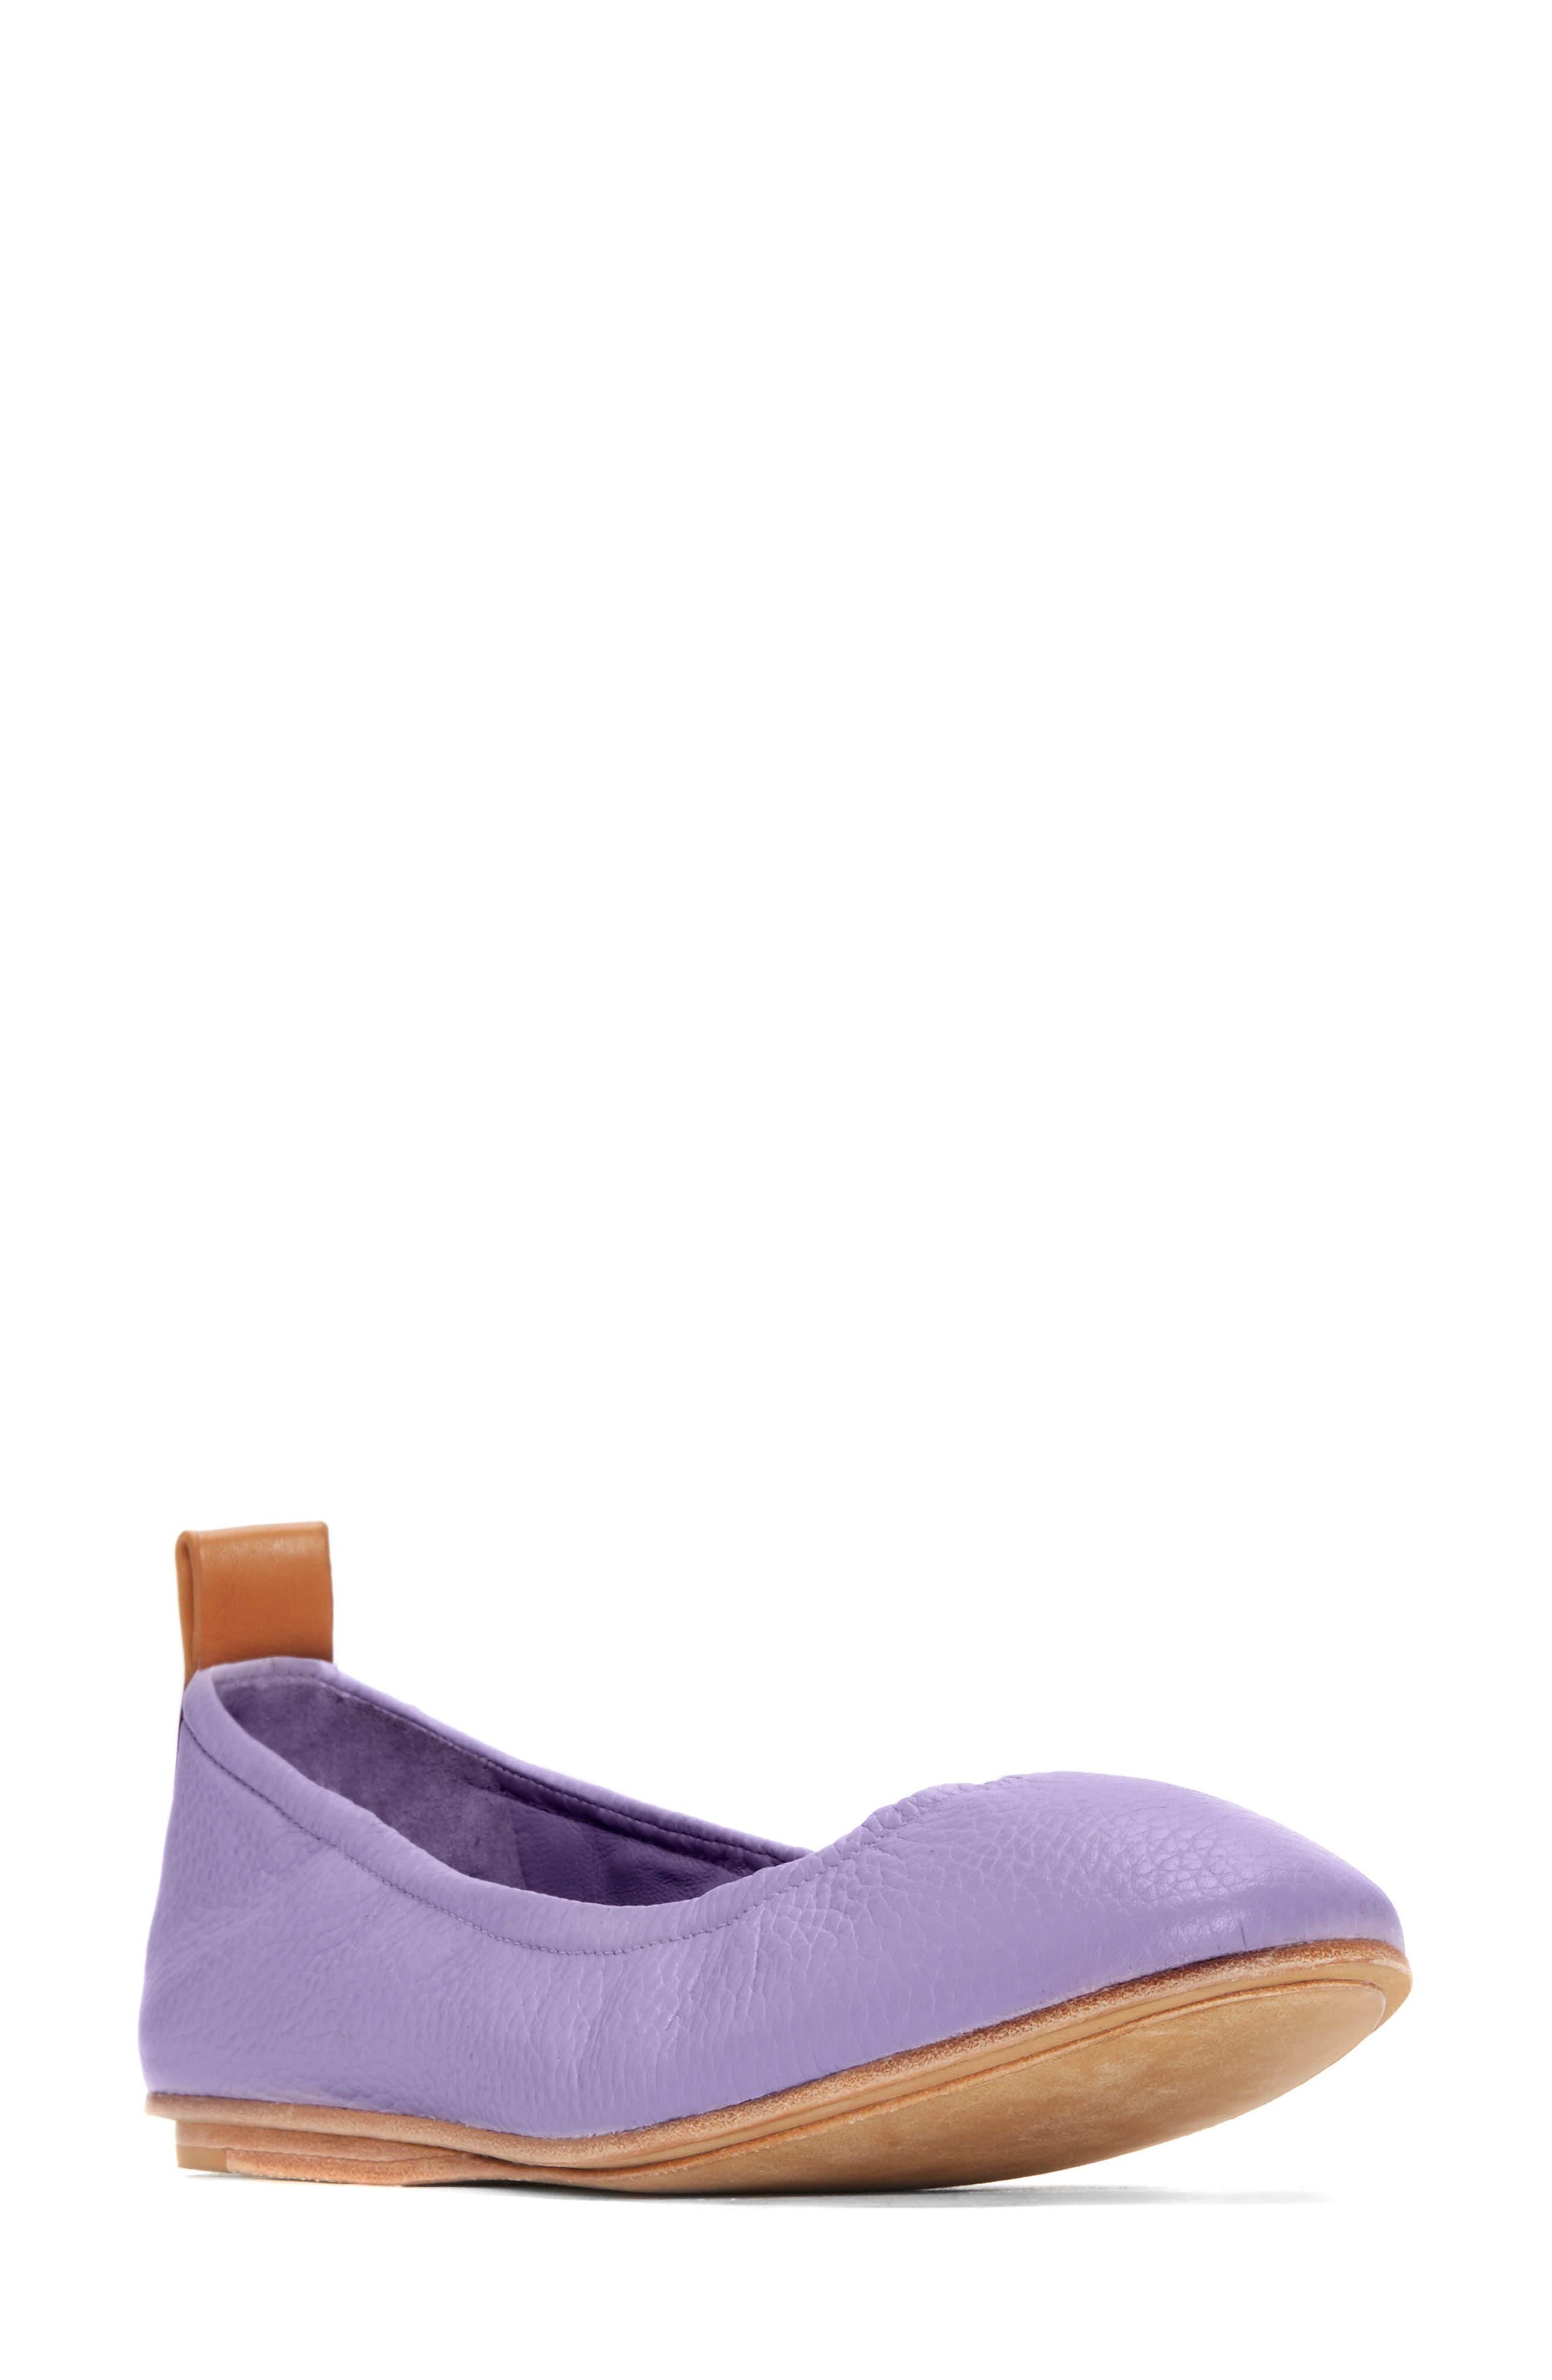 Carola Ballet Flat,                         Main,                         color, Lavender